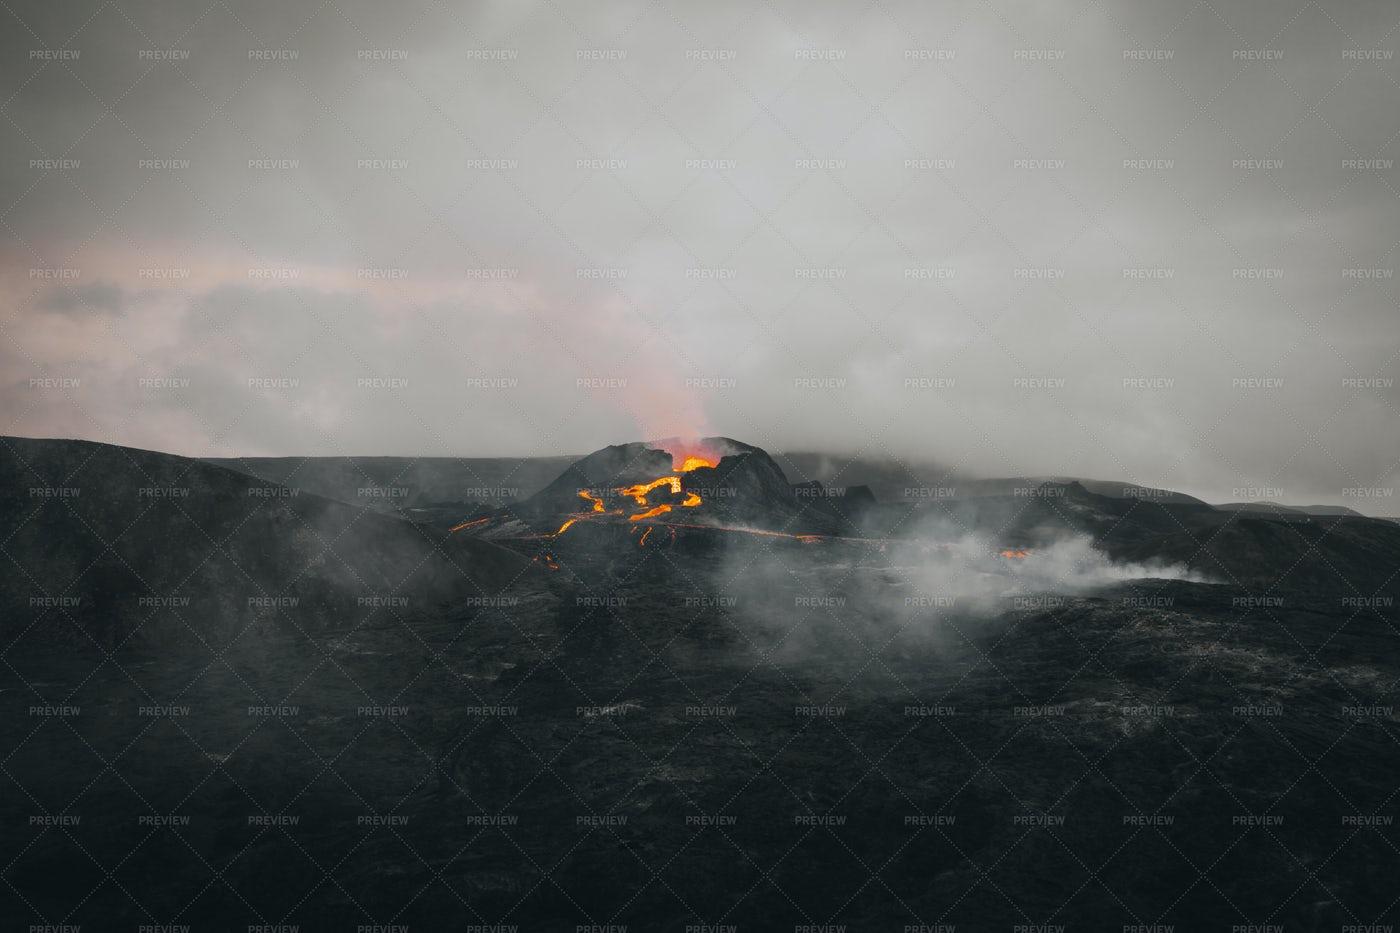 Volcano With Lava And Smoke: Stock Photos